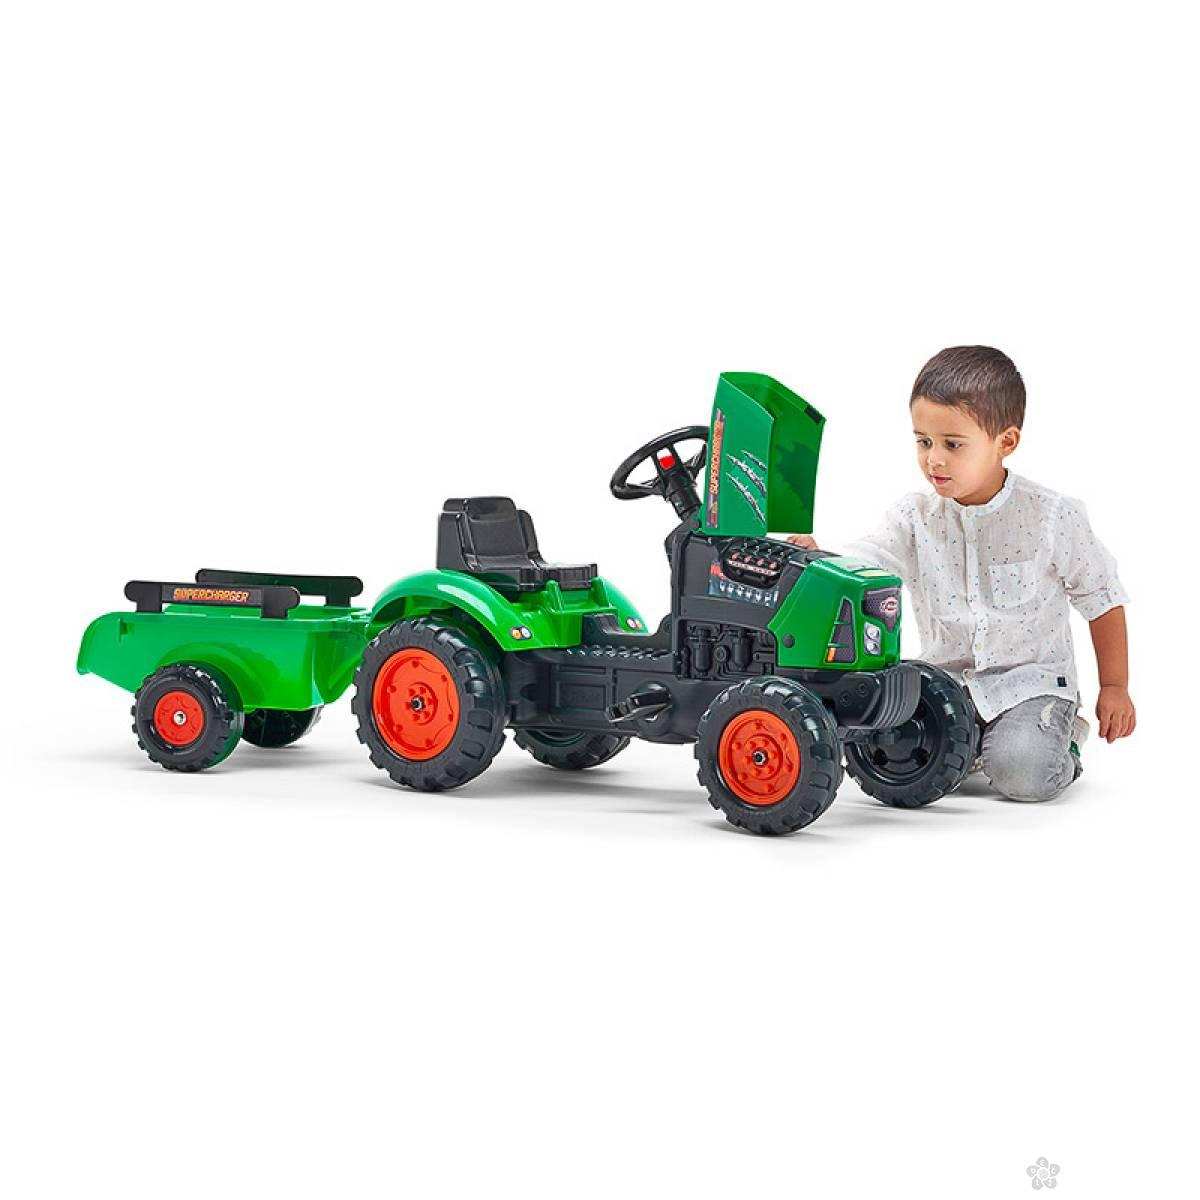 Traktor Supercharger pedale 2031ab